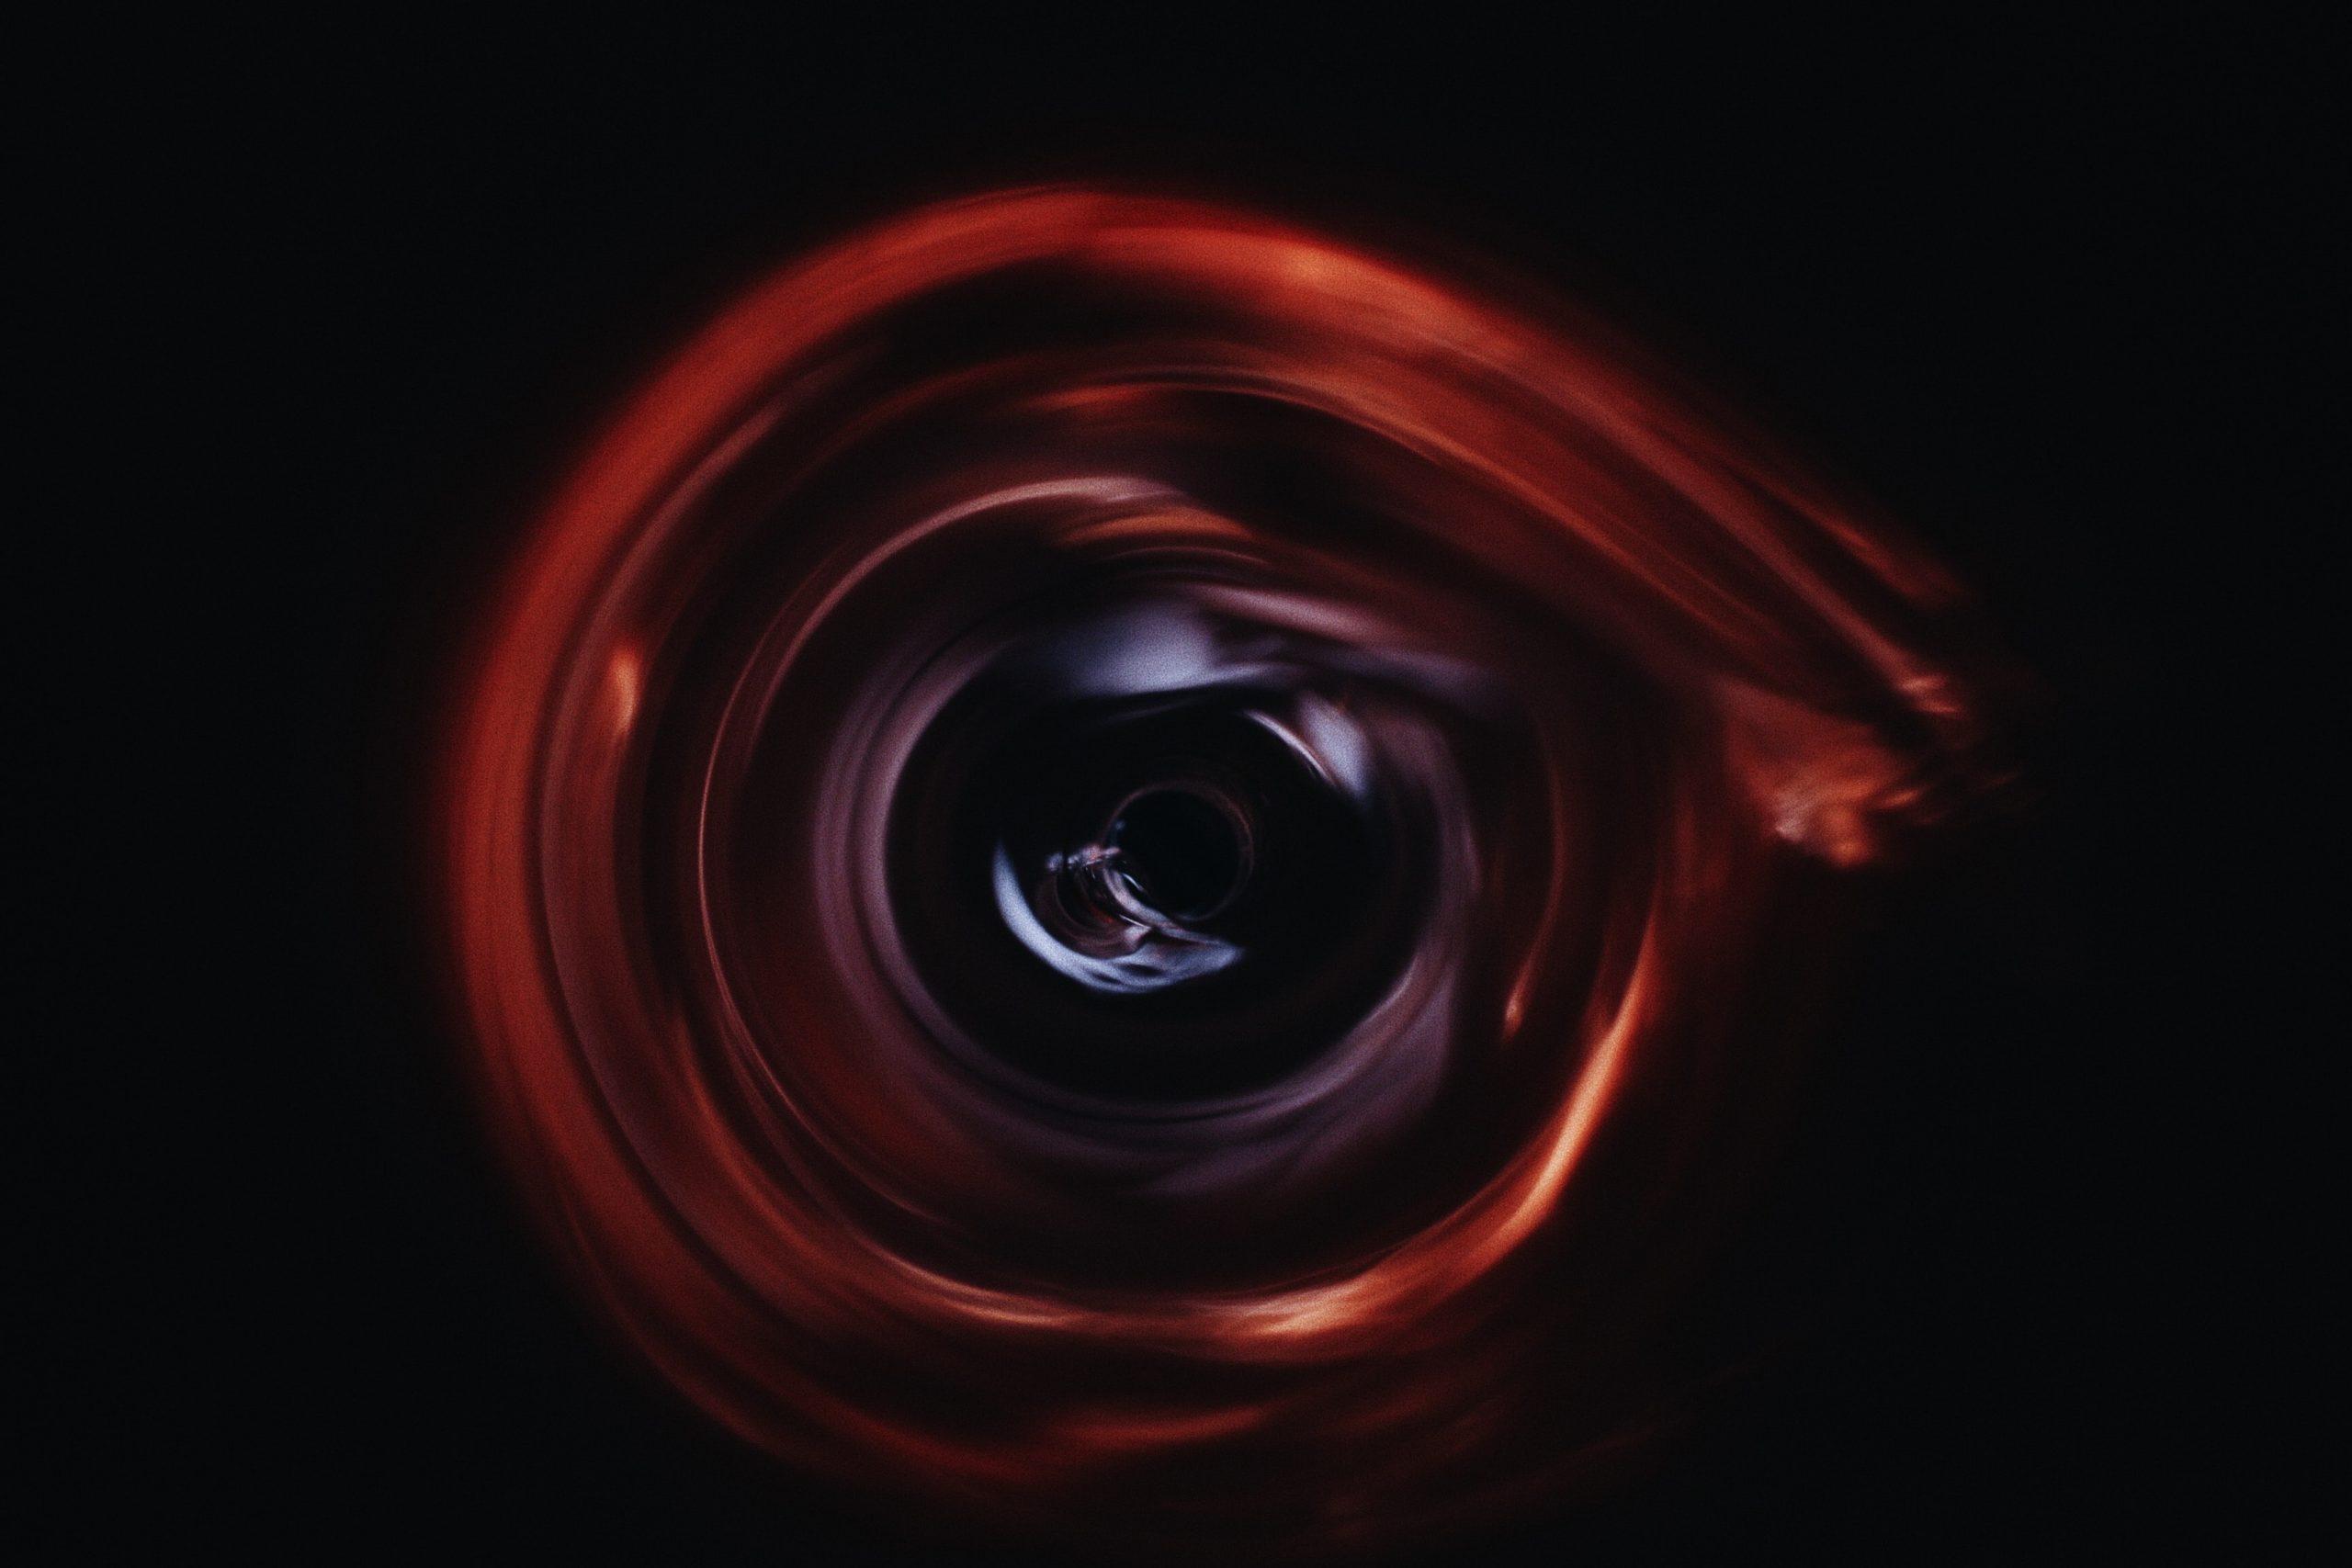 Black Hole Breakthroughs Win Nobel Physics Prize